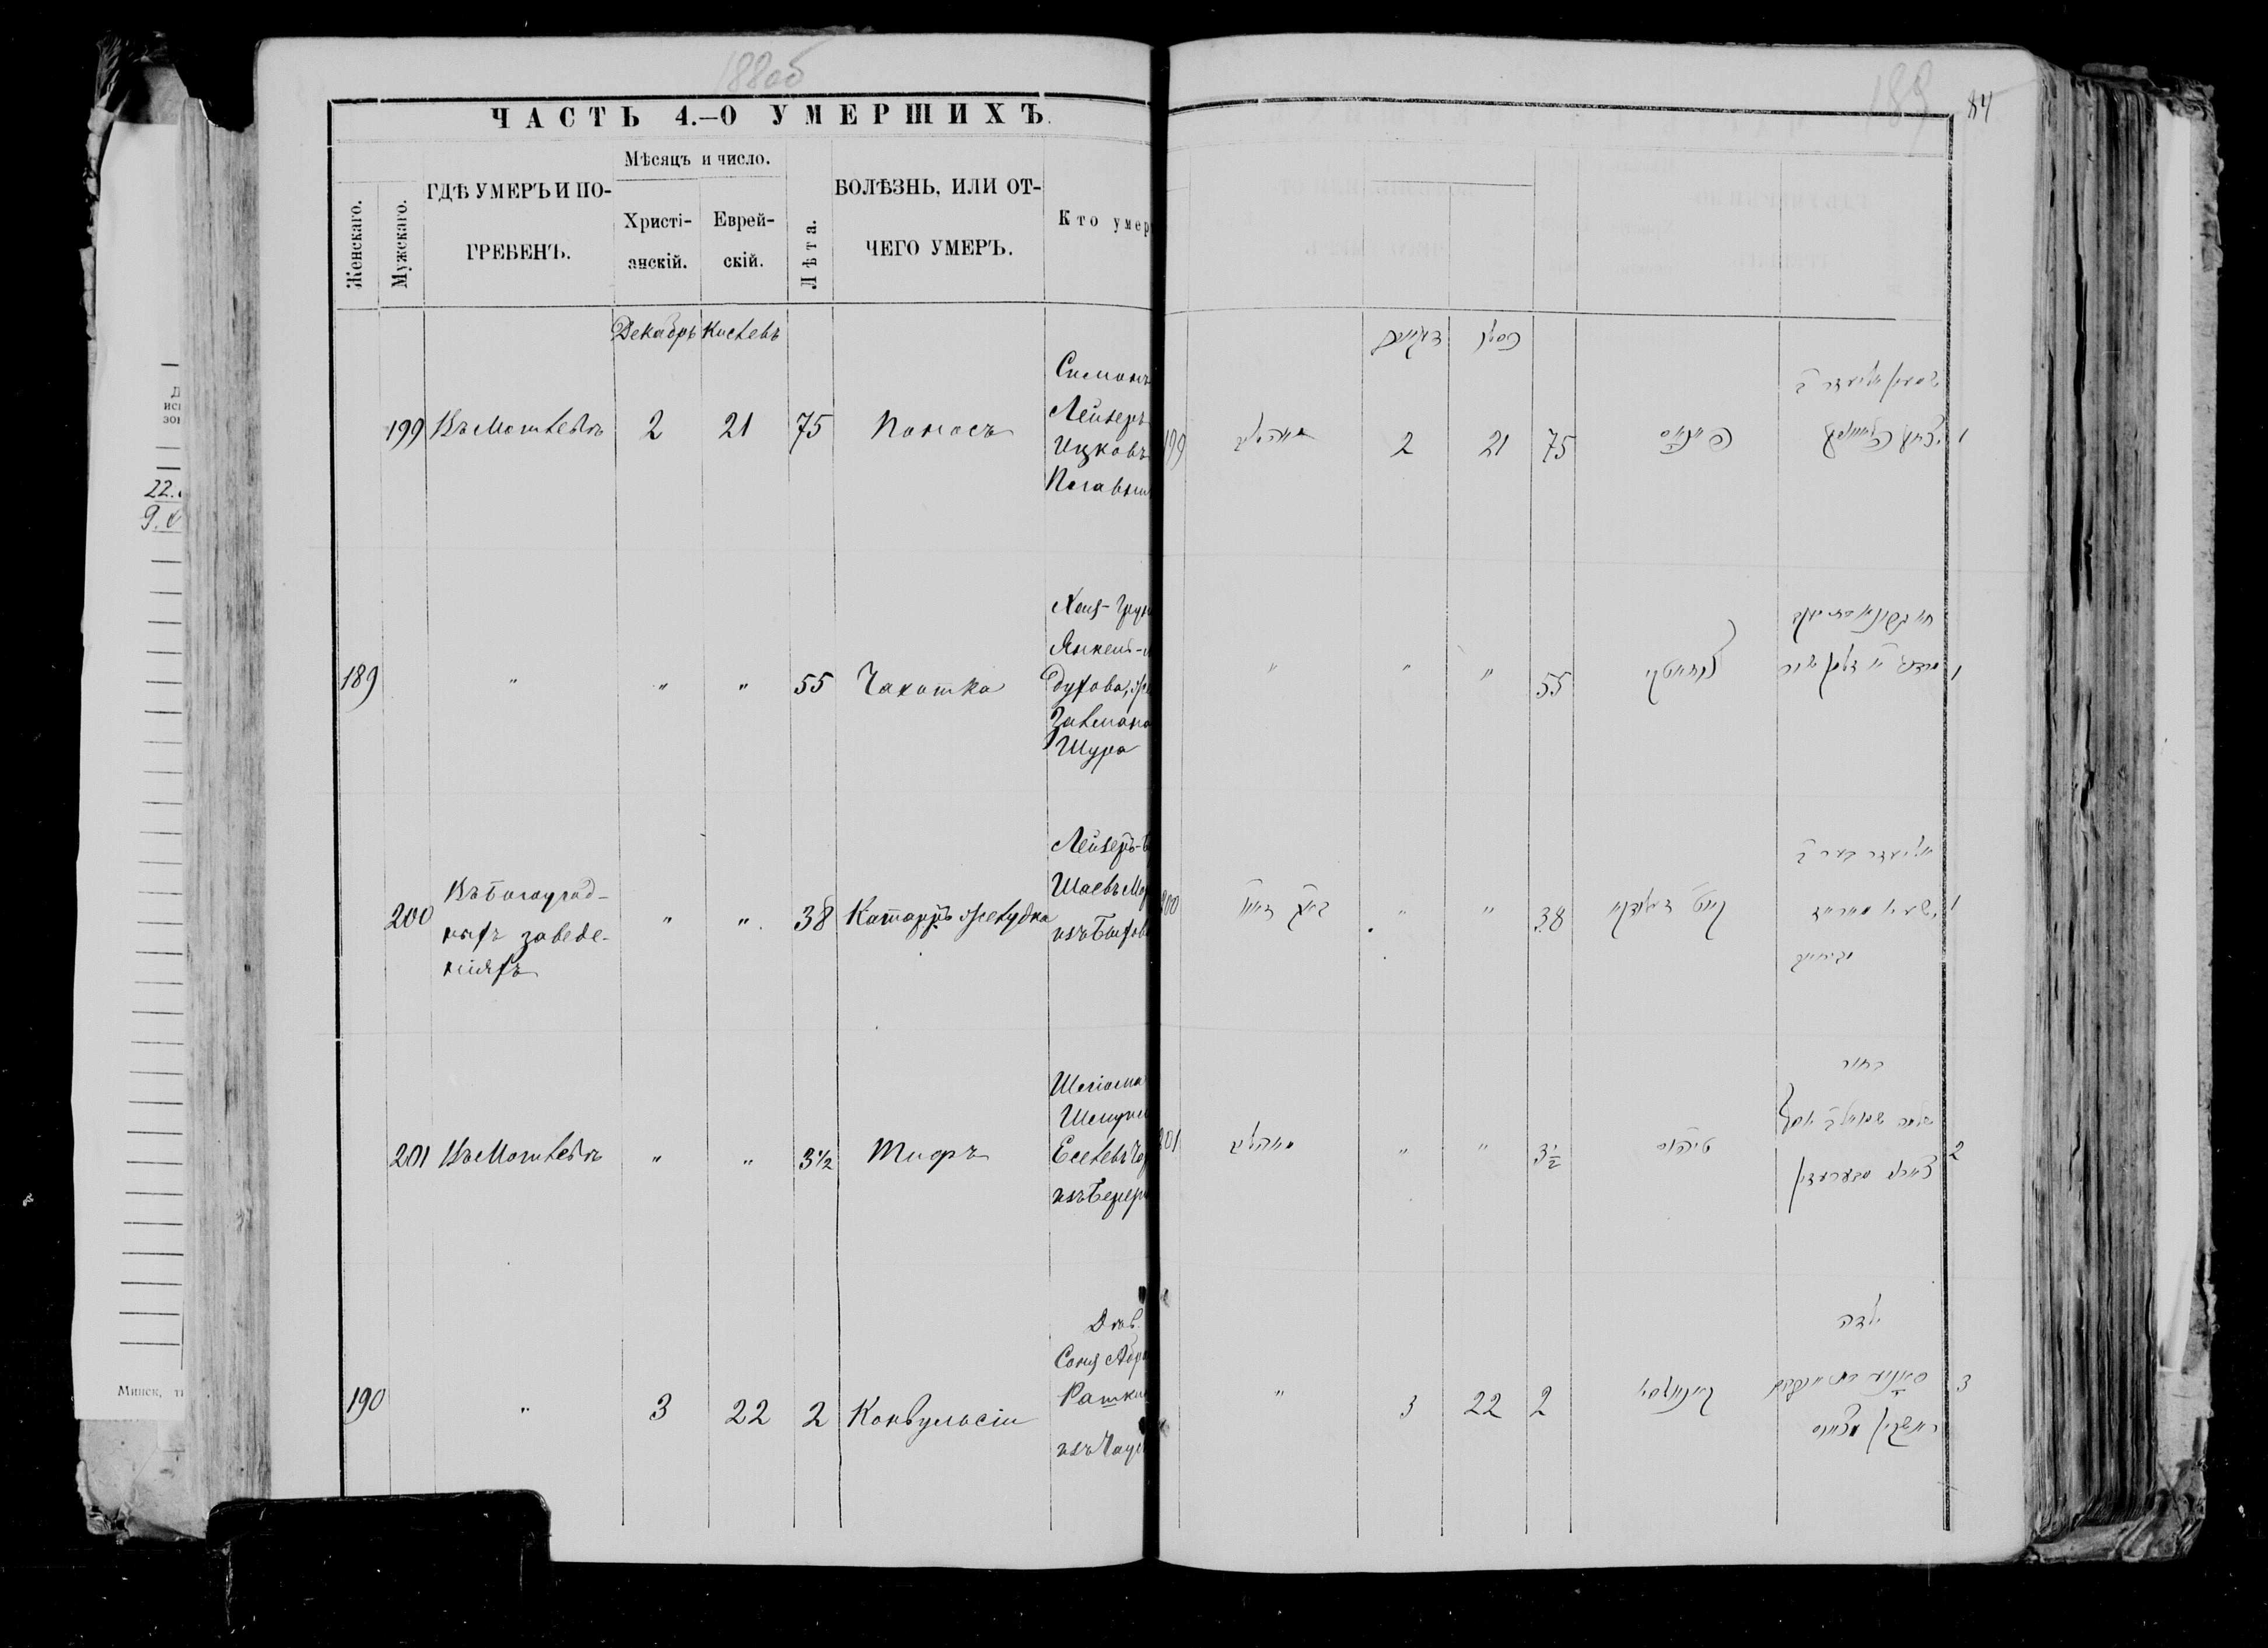 Хая-Груня Янкель-Мордуховна, жена Залмана Шура 2 декабря 1889, запись 189, пленка 004563097, снимок 302